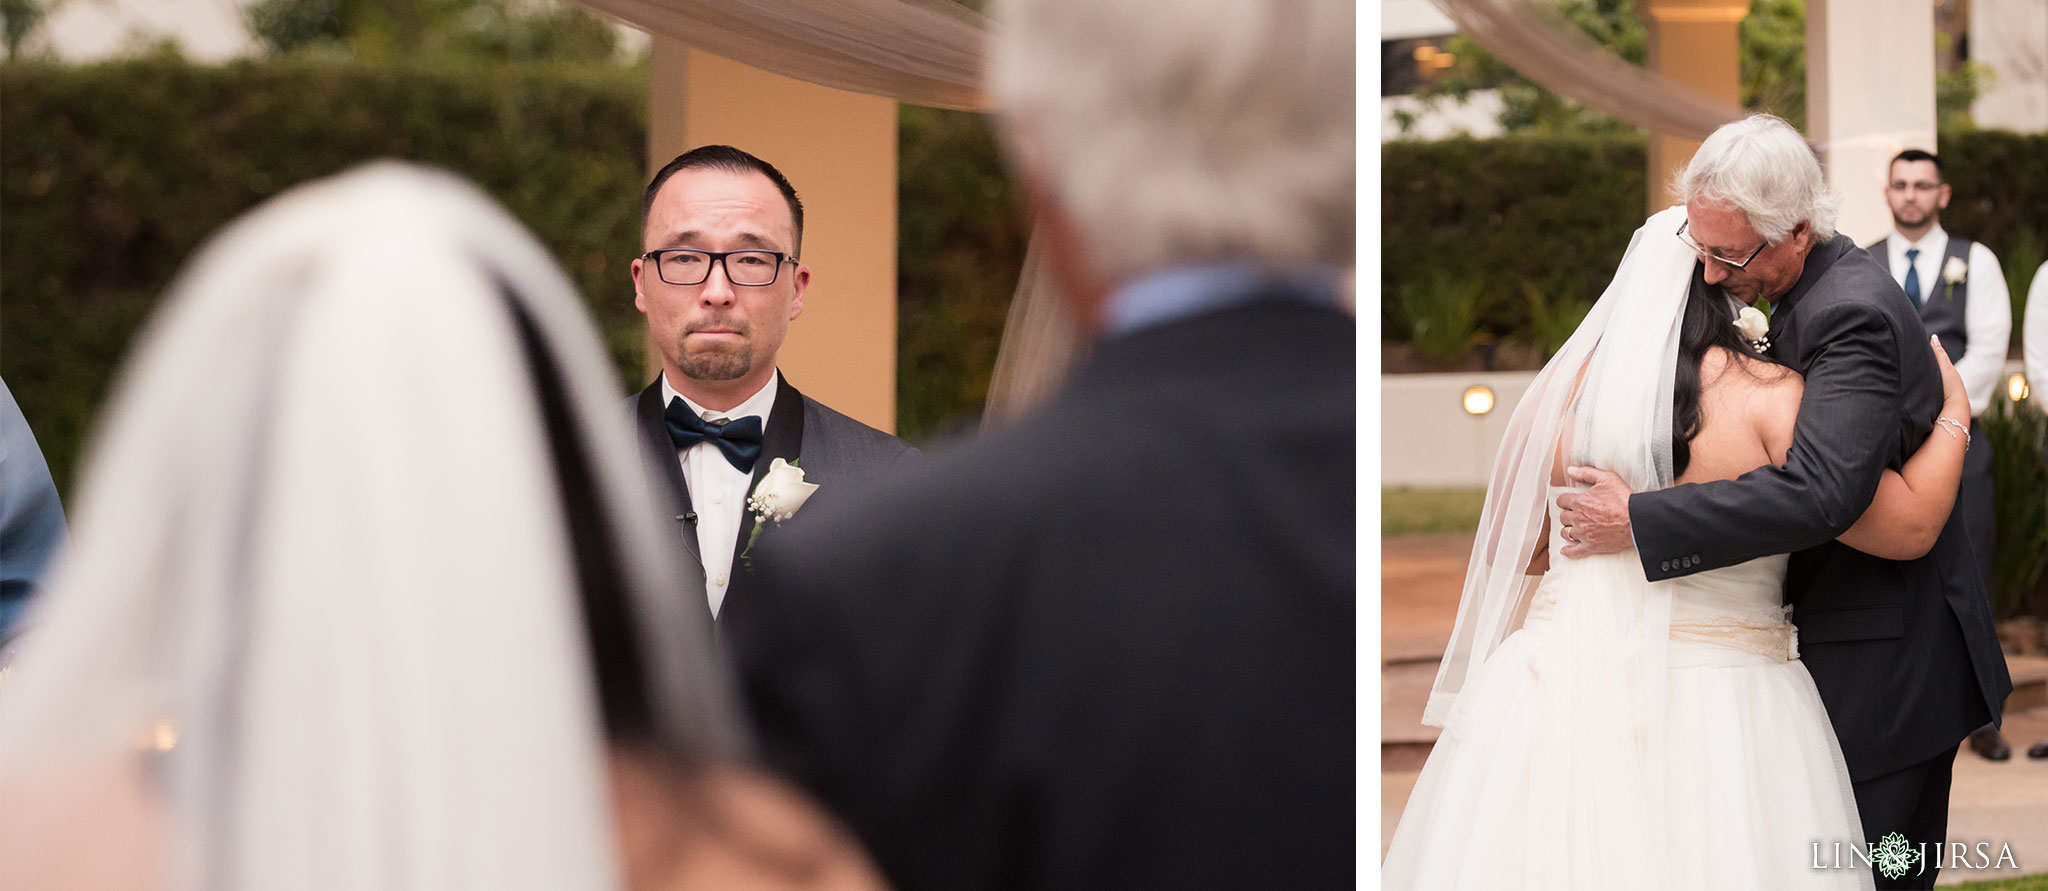 21 turnip rose promenade orange county wedding ceremony photography